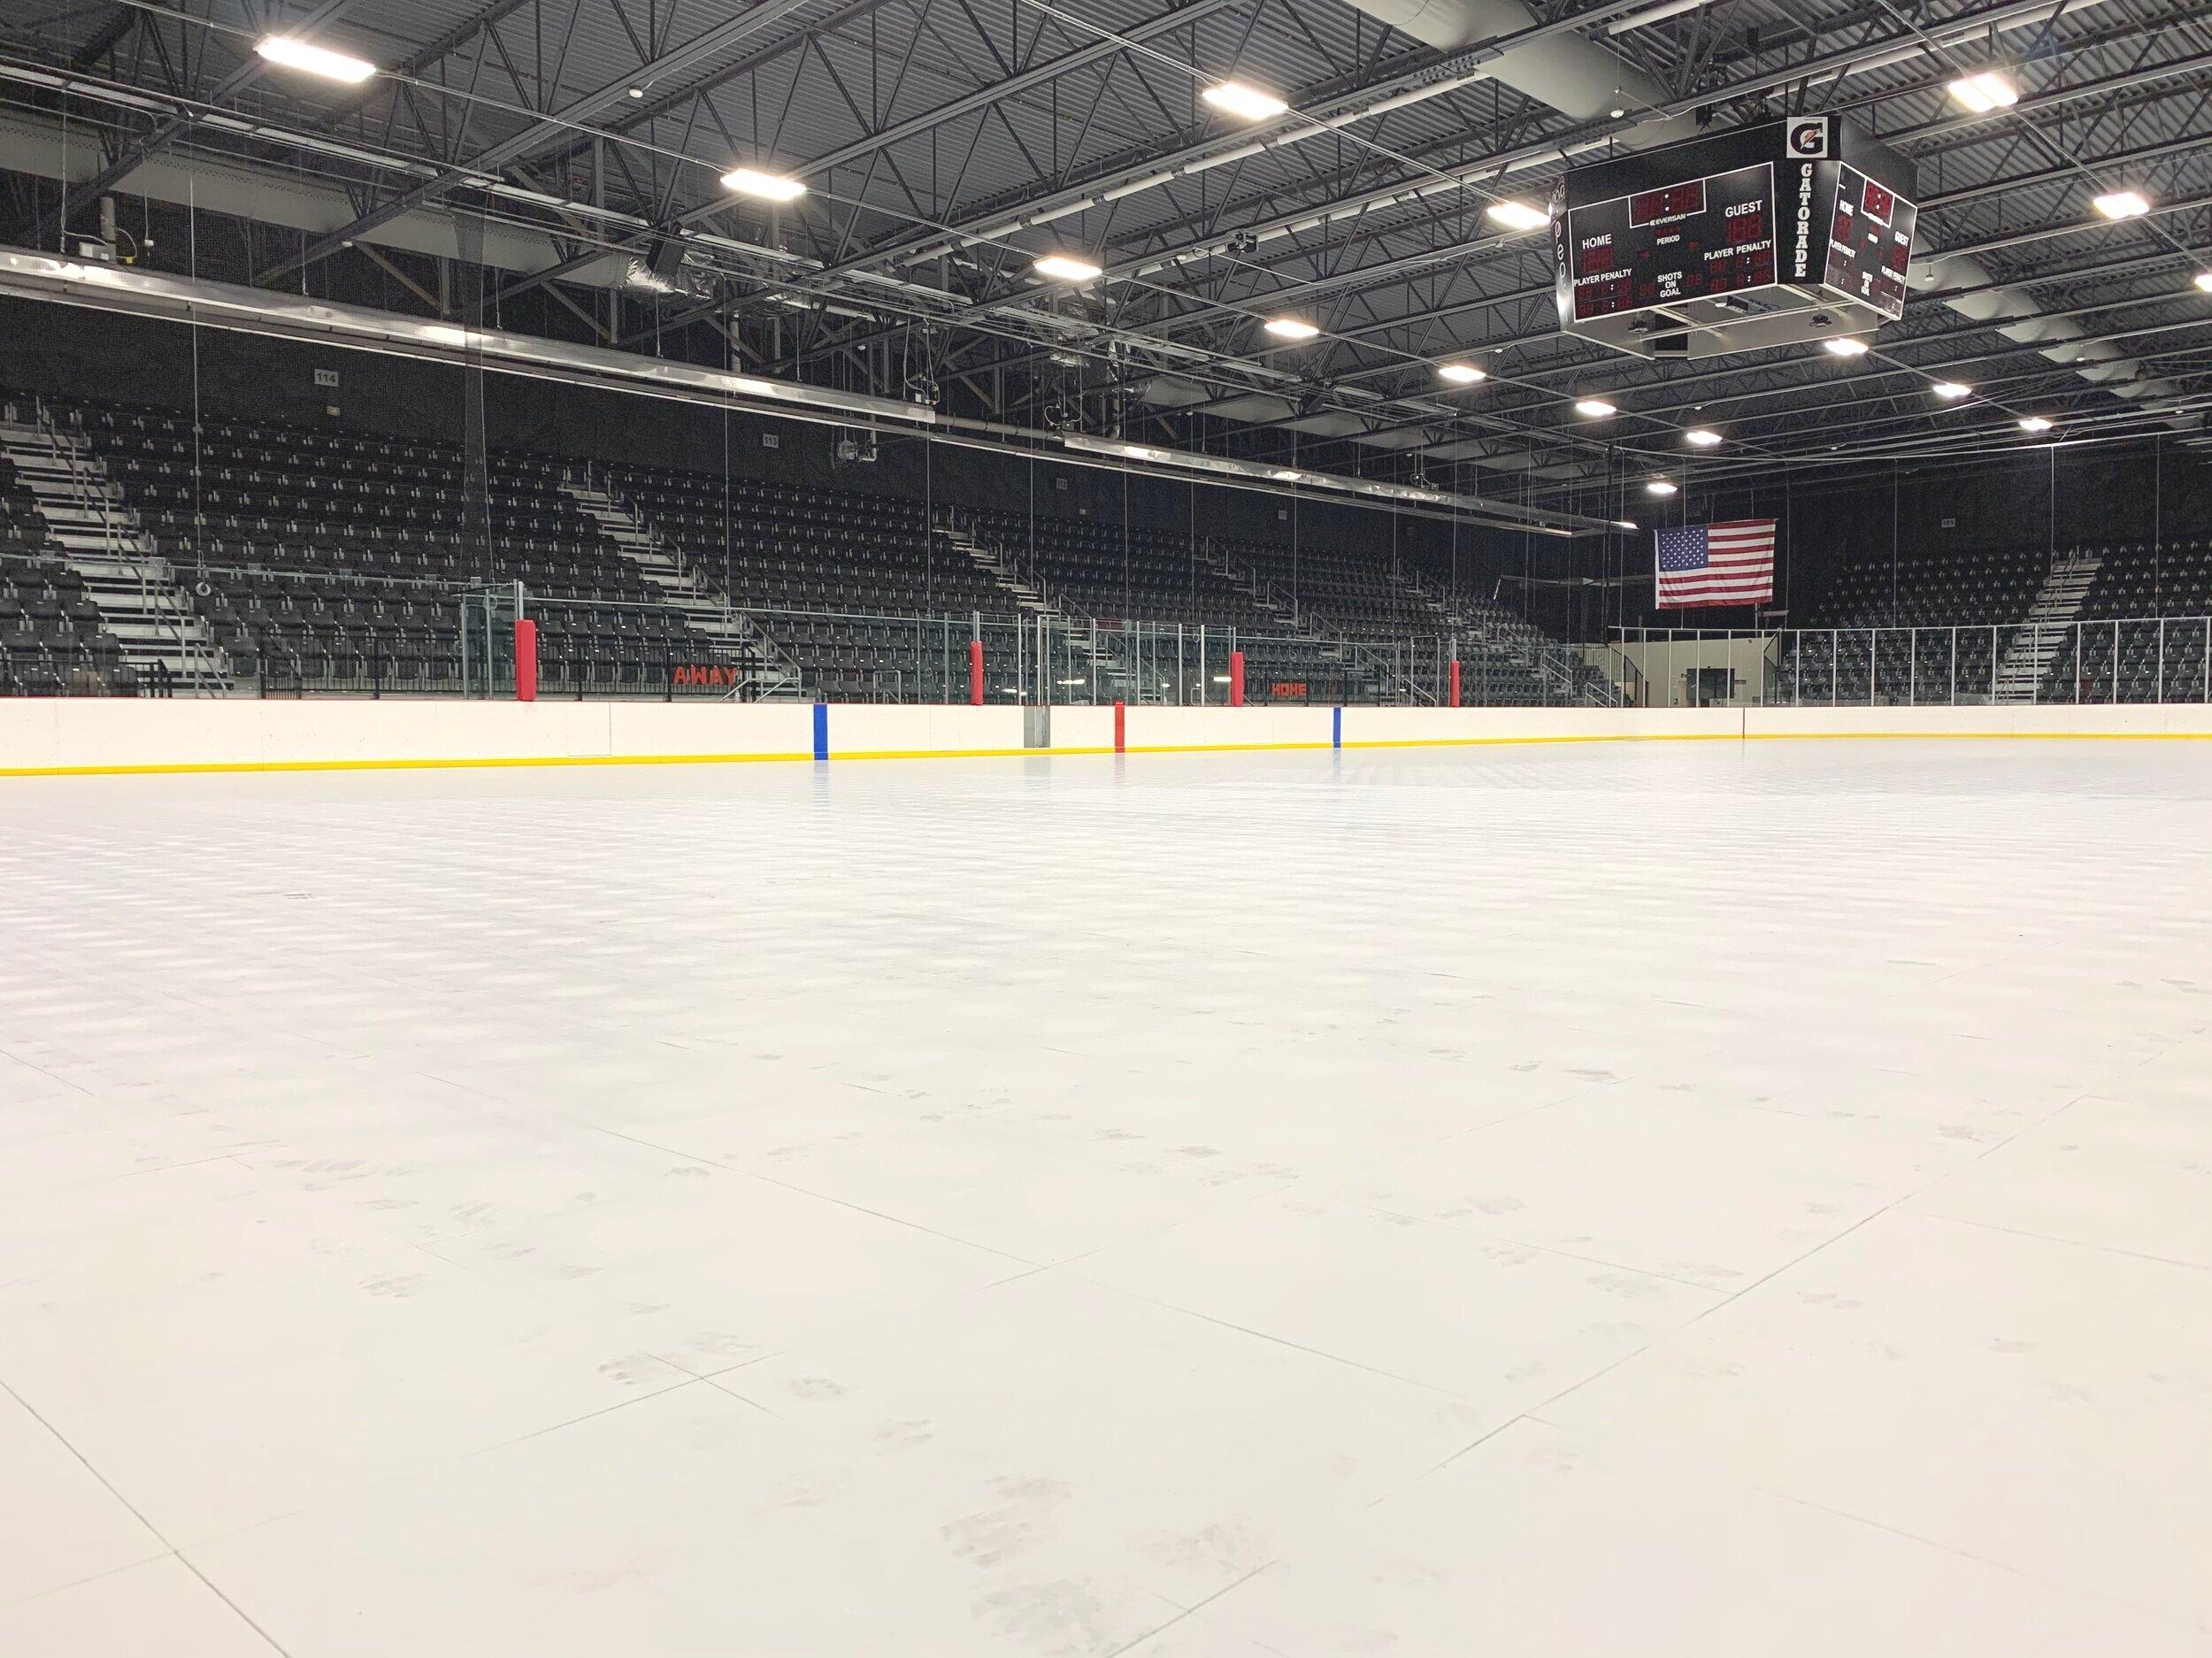 Ice+arena+floor+system